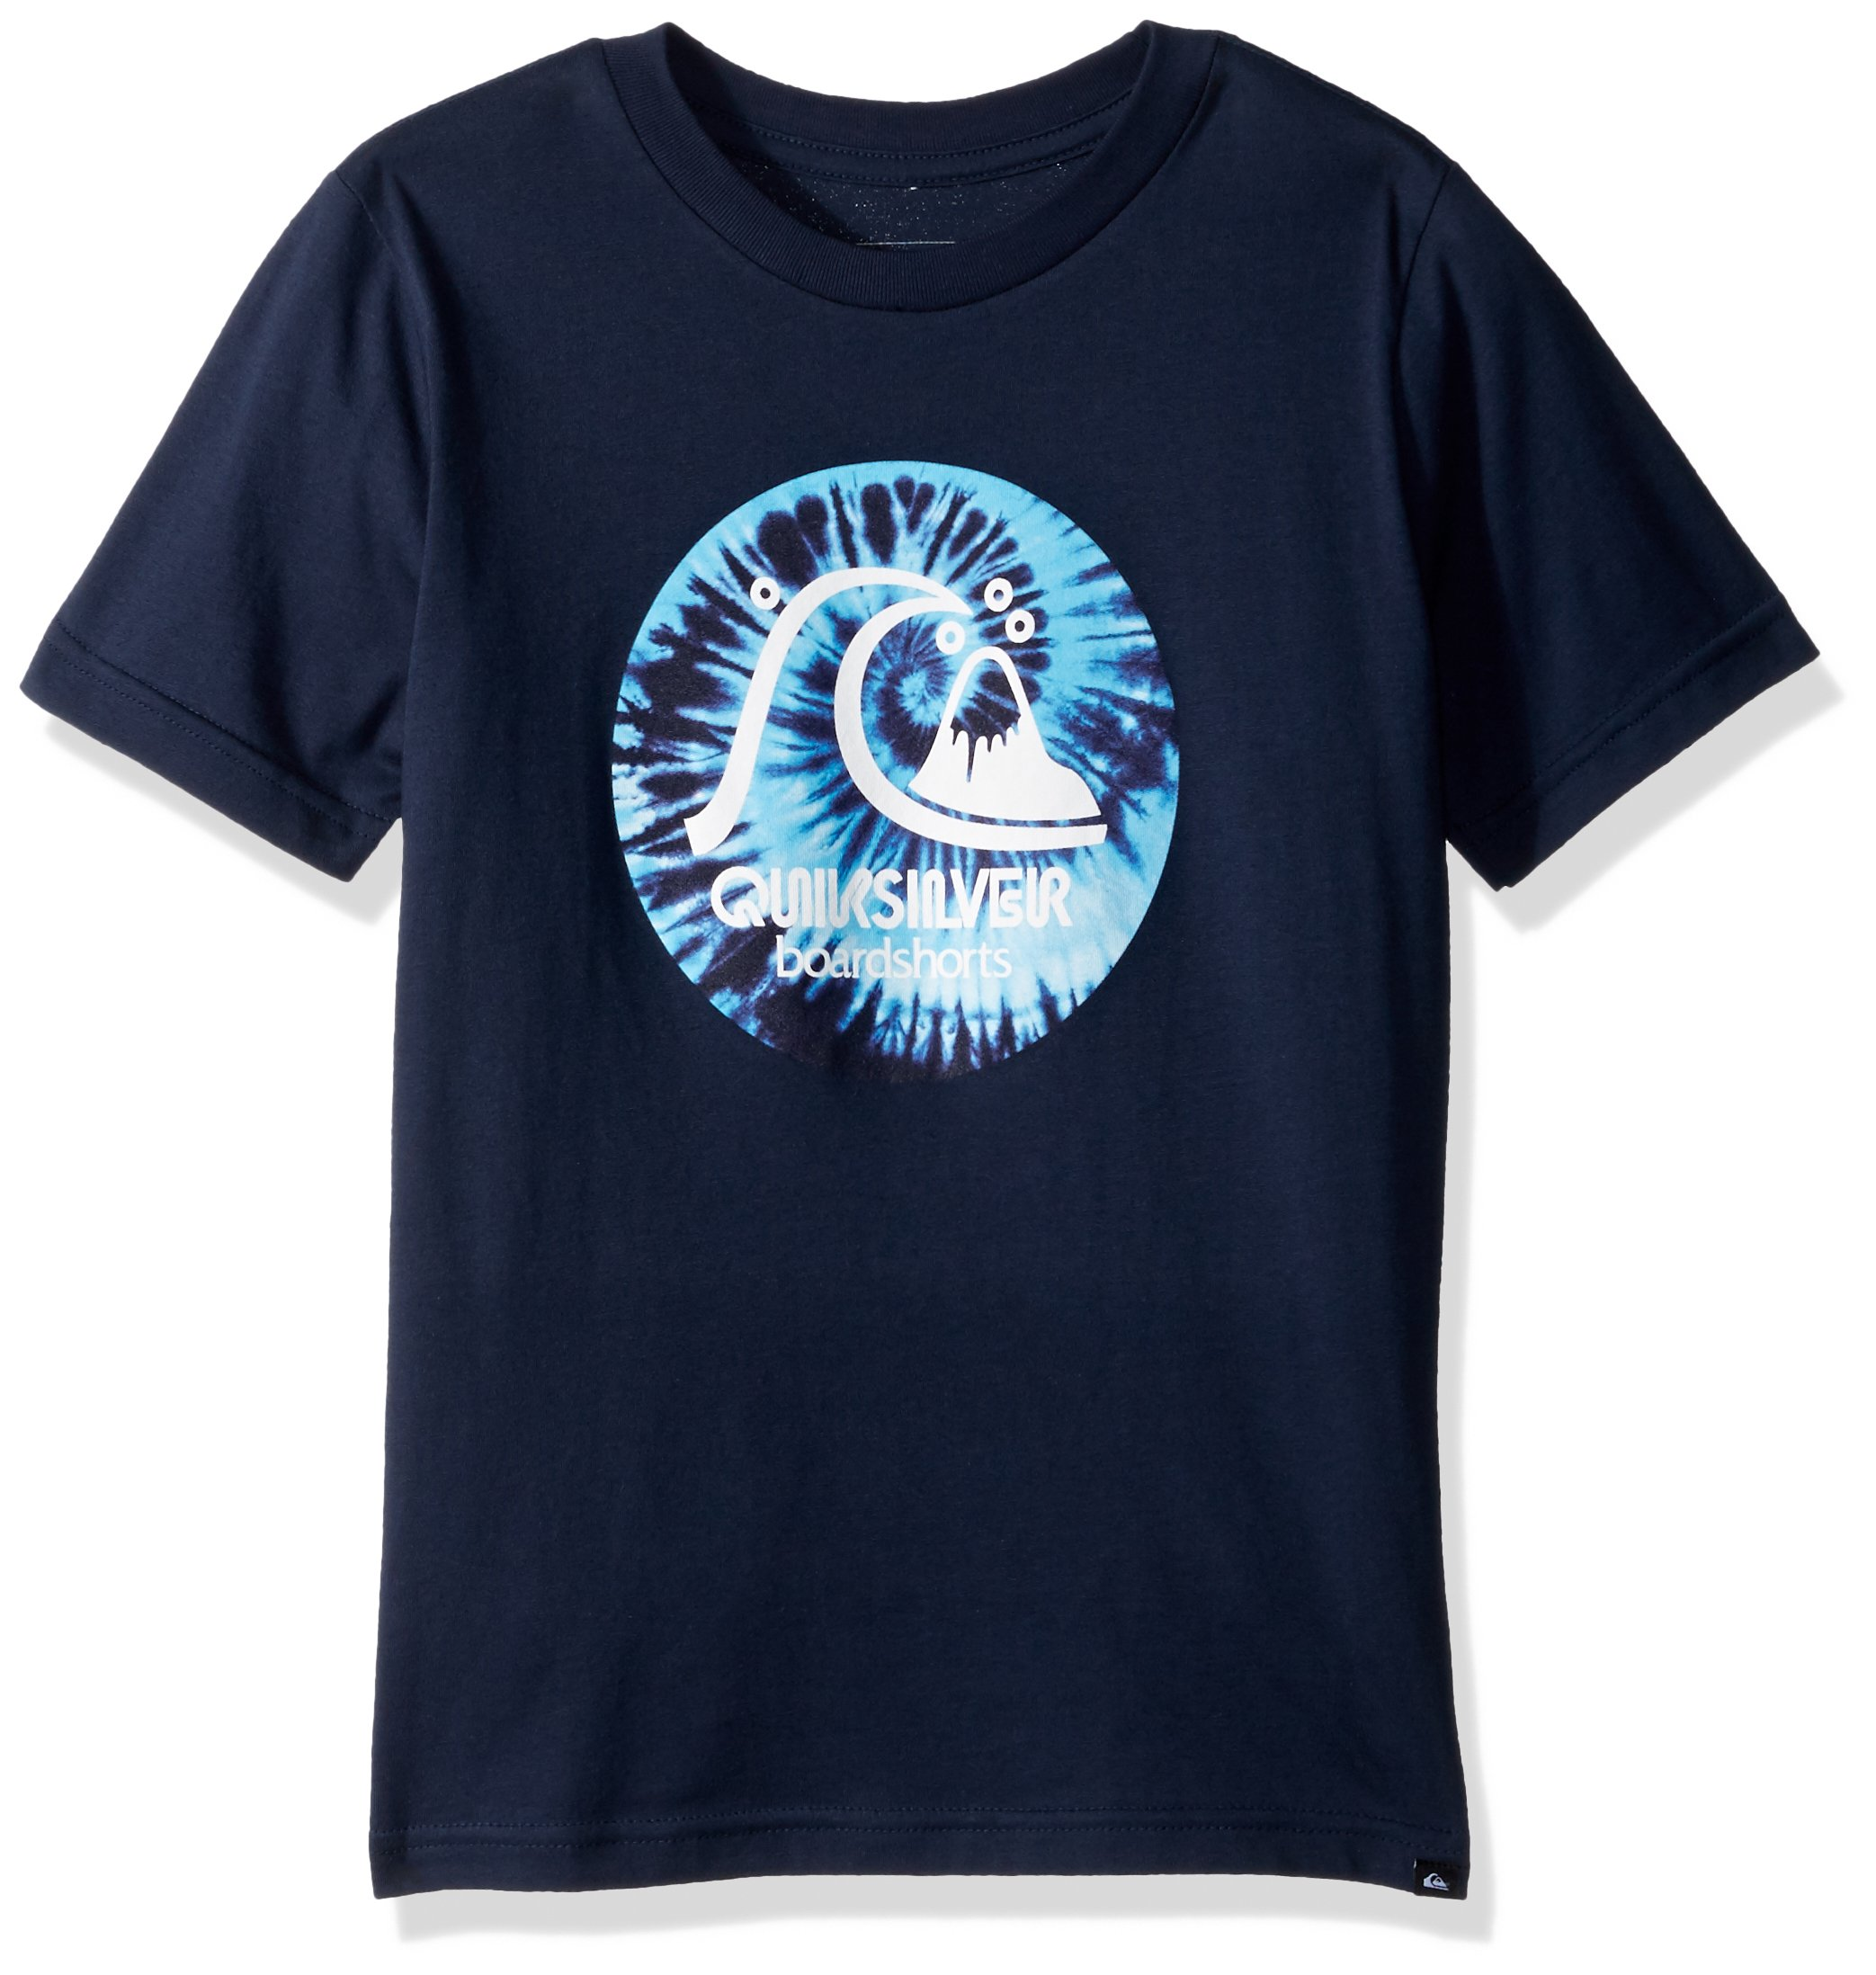 Quiksilver Big Boys' Original Light Youth Tee Shirt, Navy Blazer, L/14